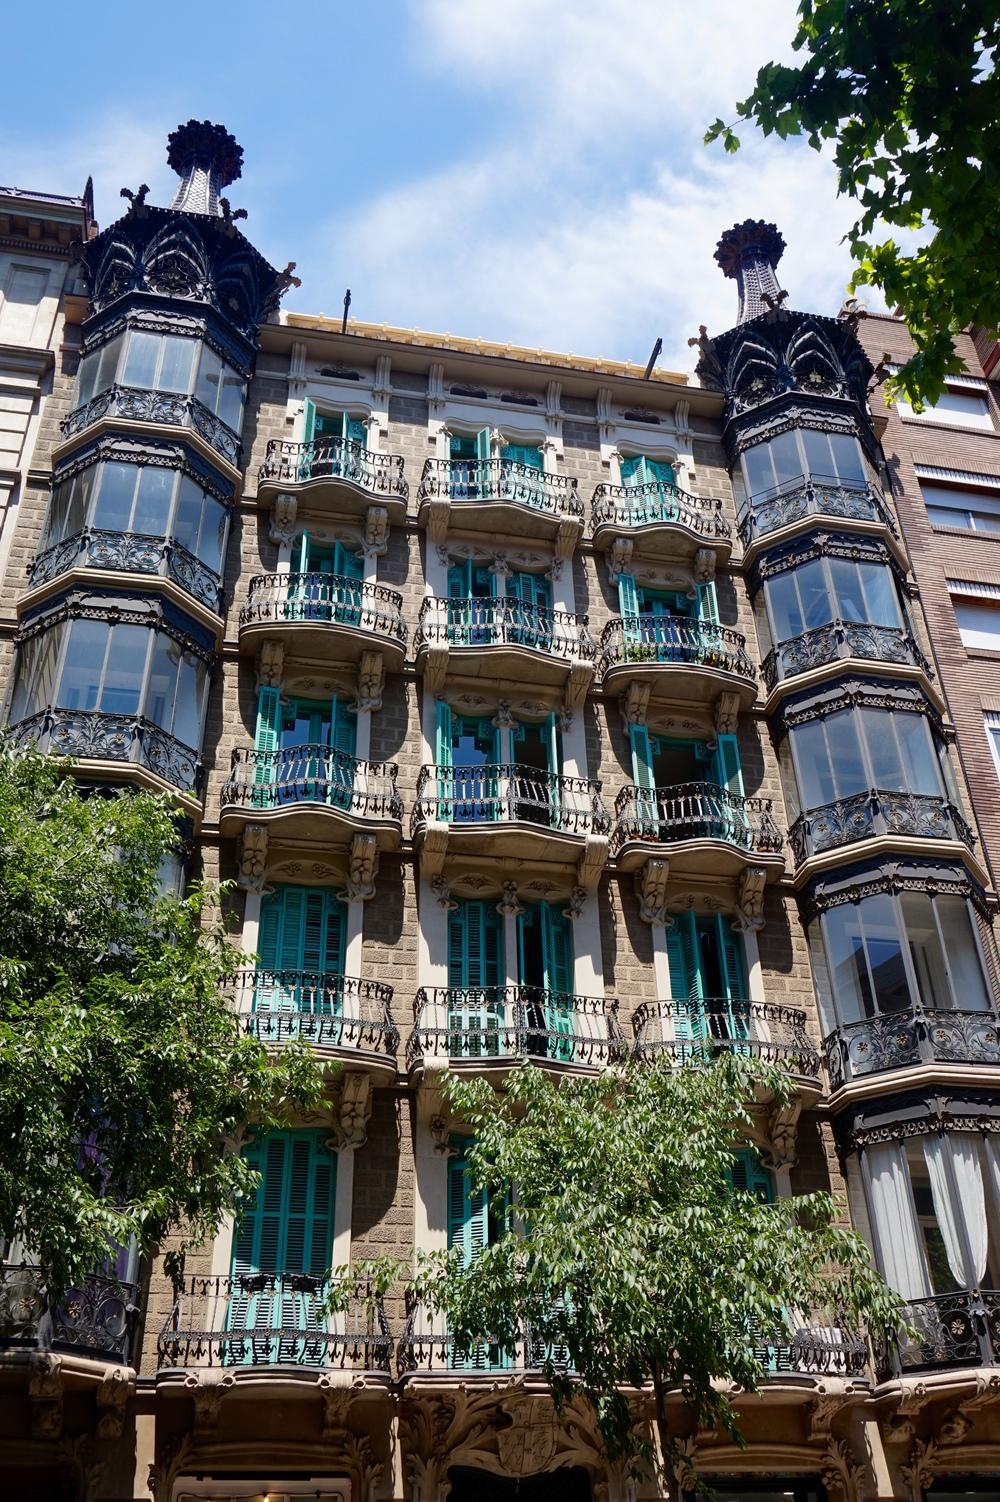 barcelonabalconies.jpg